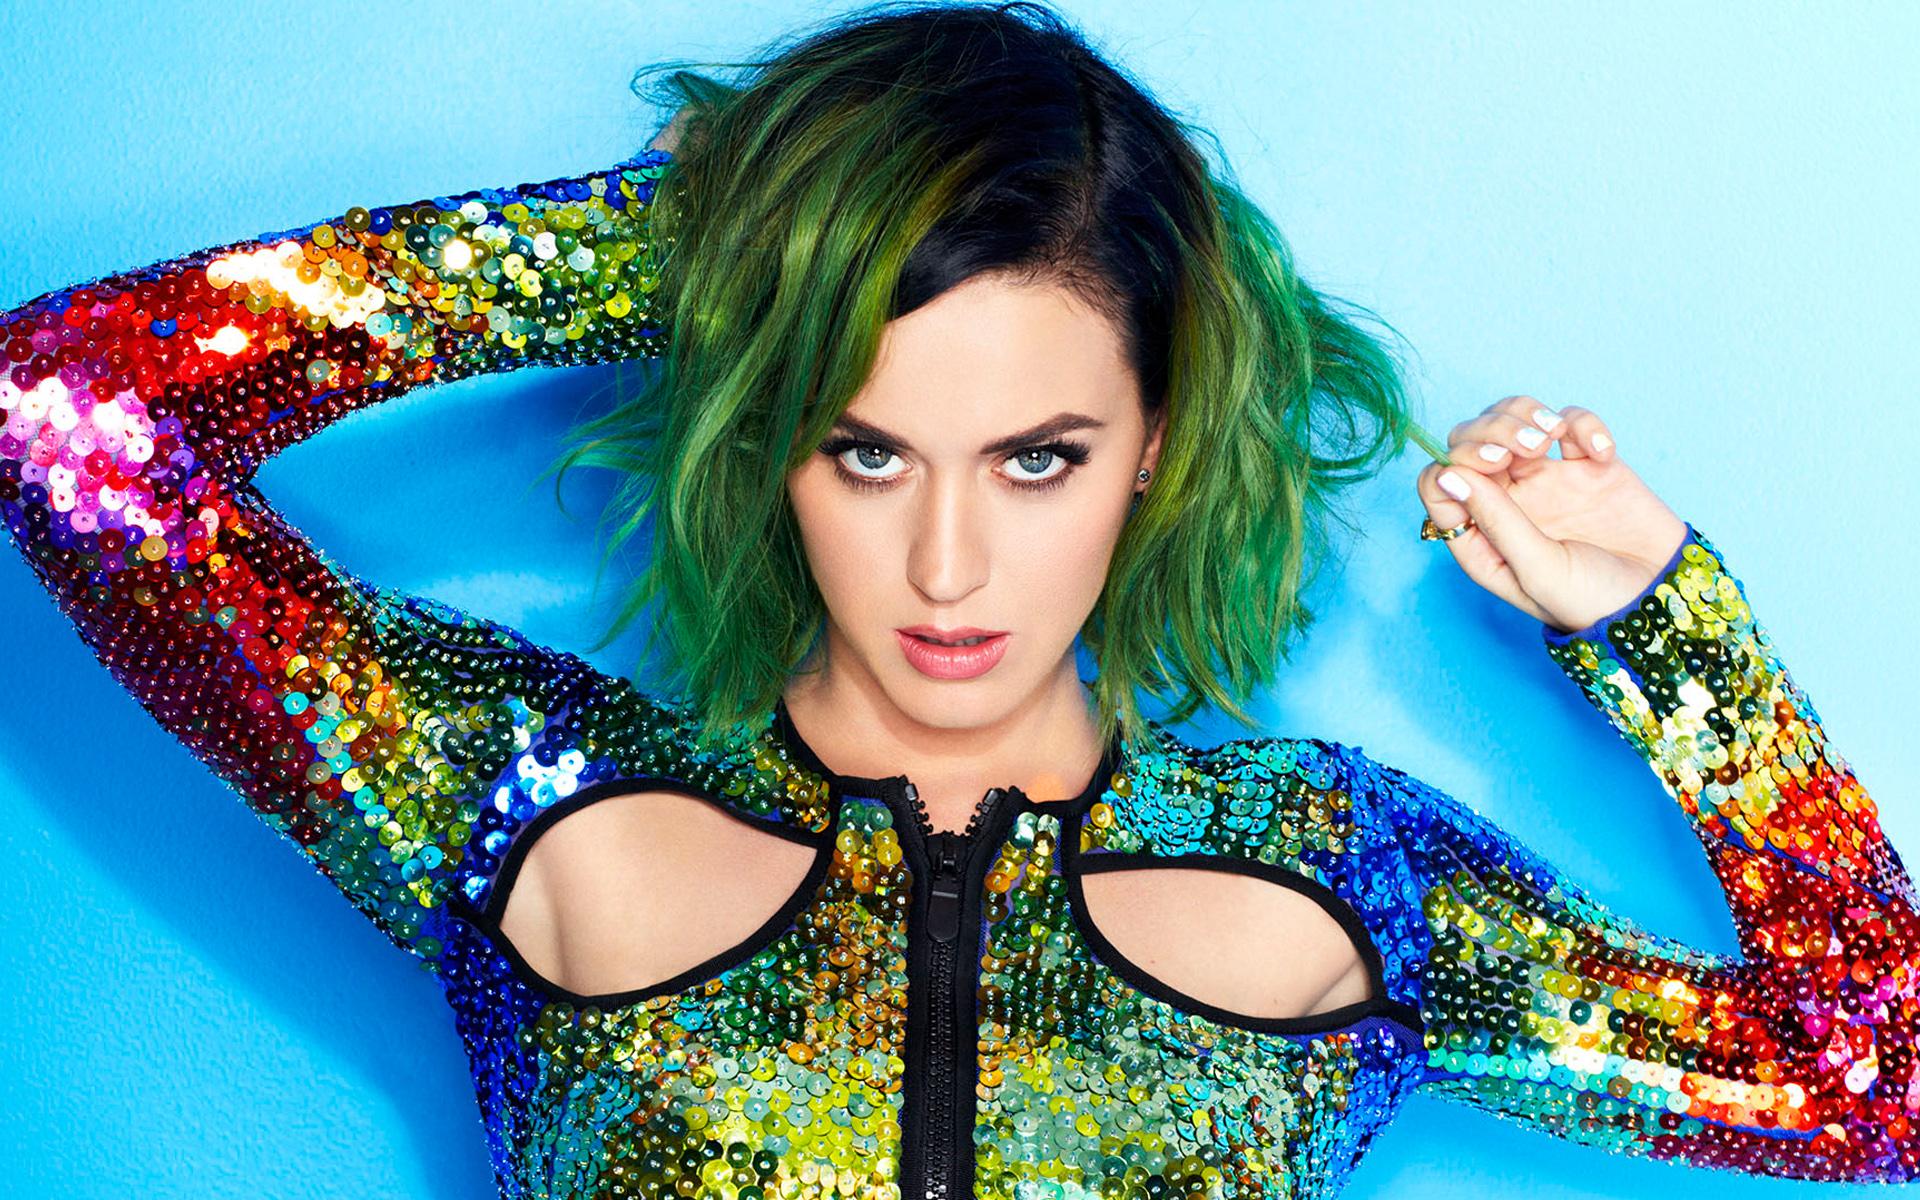 Fall Out Boy Quotes Wallpaper Cute Hd Wallpaper Katy Perry Pixelstalk Net